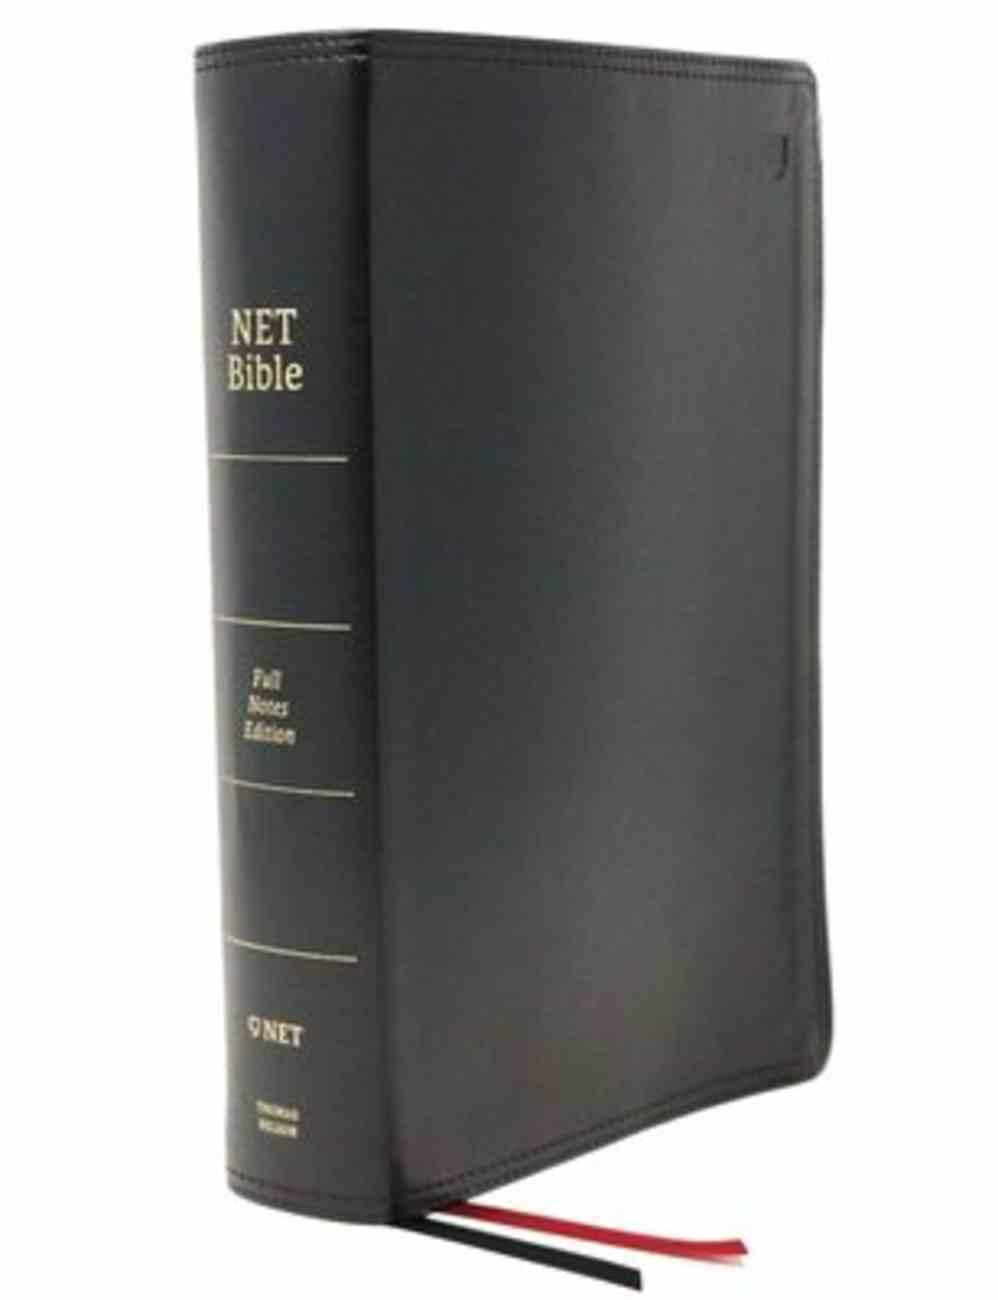 NET Bible Full-Notes Edition Black Indexed Premium Imitation Leather